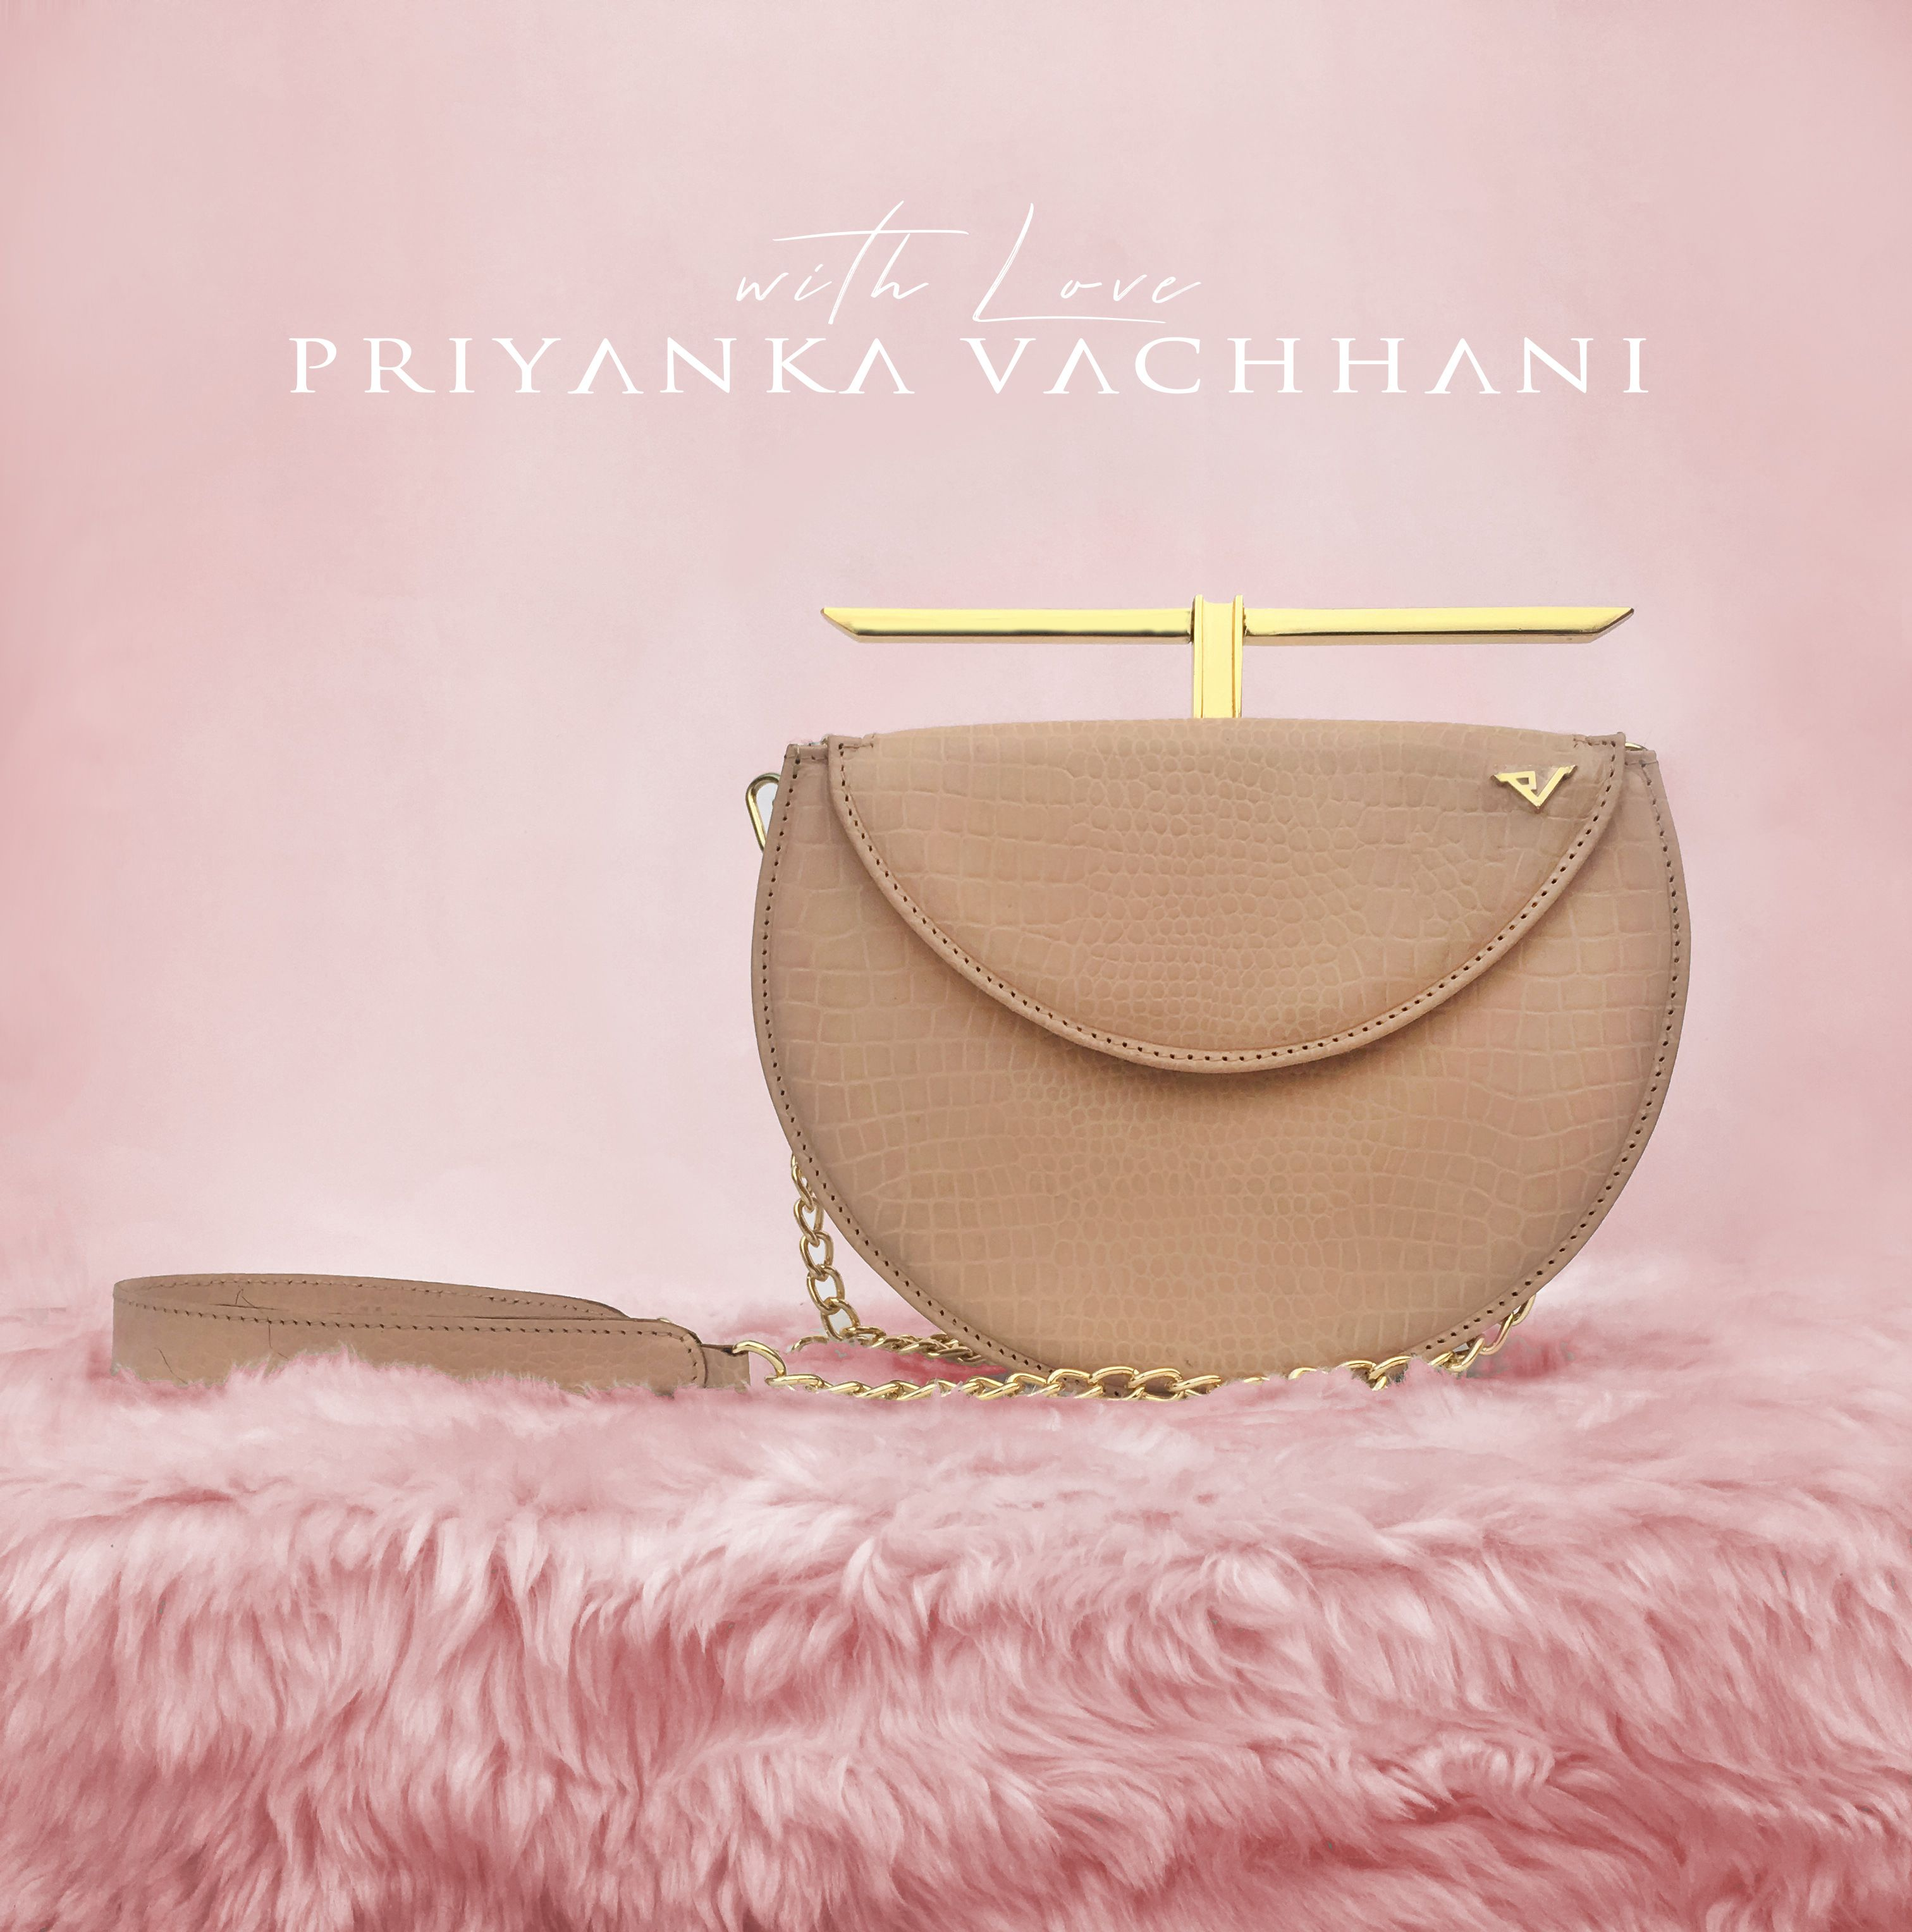 priyankavachhani  millenialpink  designer  bag  label  unique  trend   trending cfbd795114702